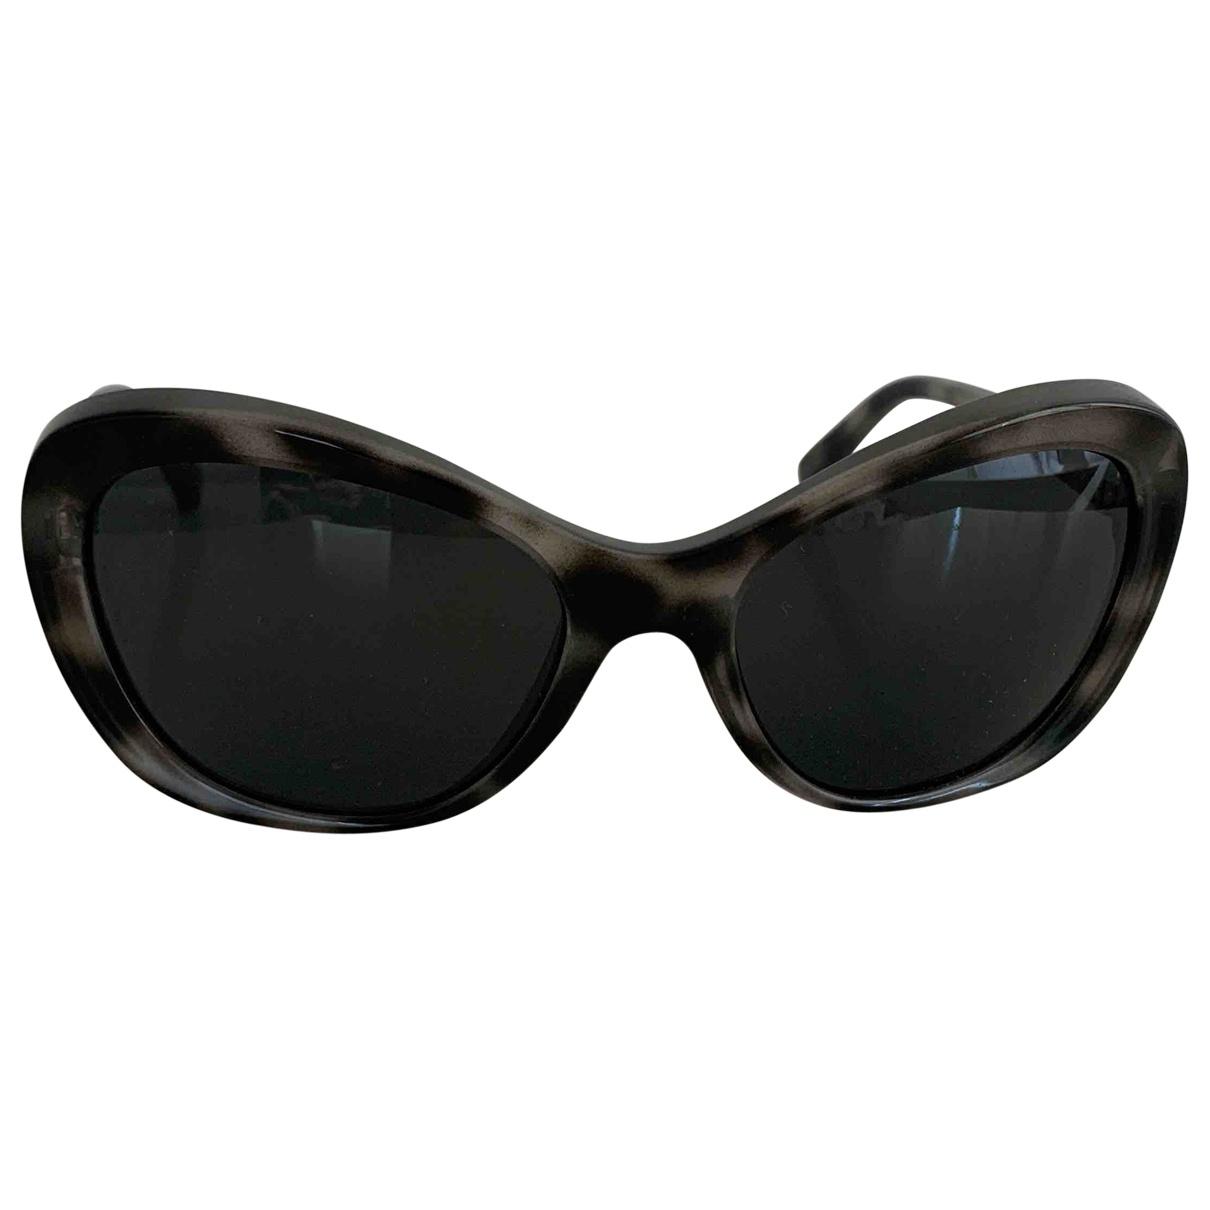 D&g \N Sonnenbrillen in  Grau Kunststoff